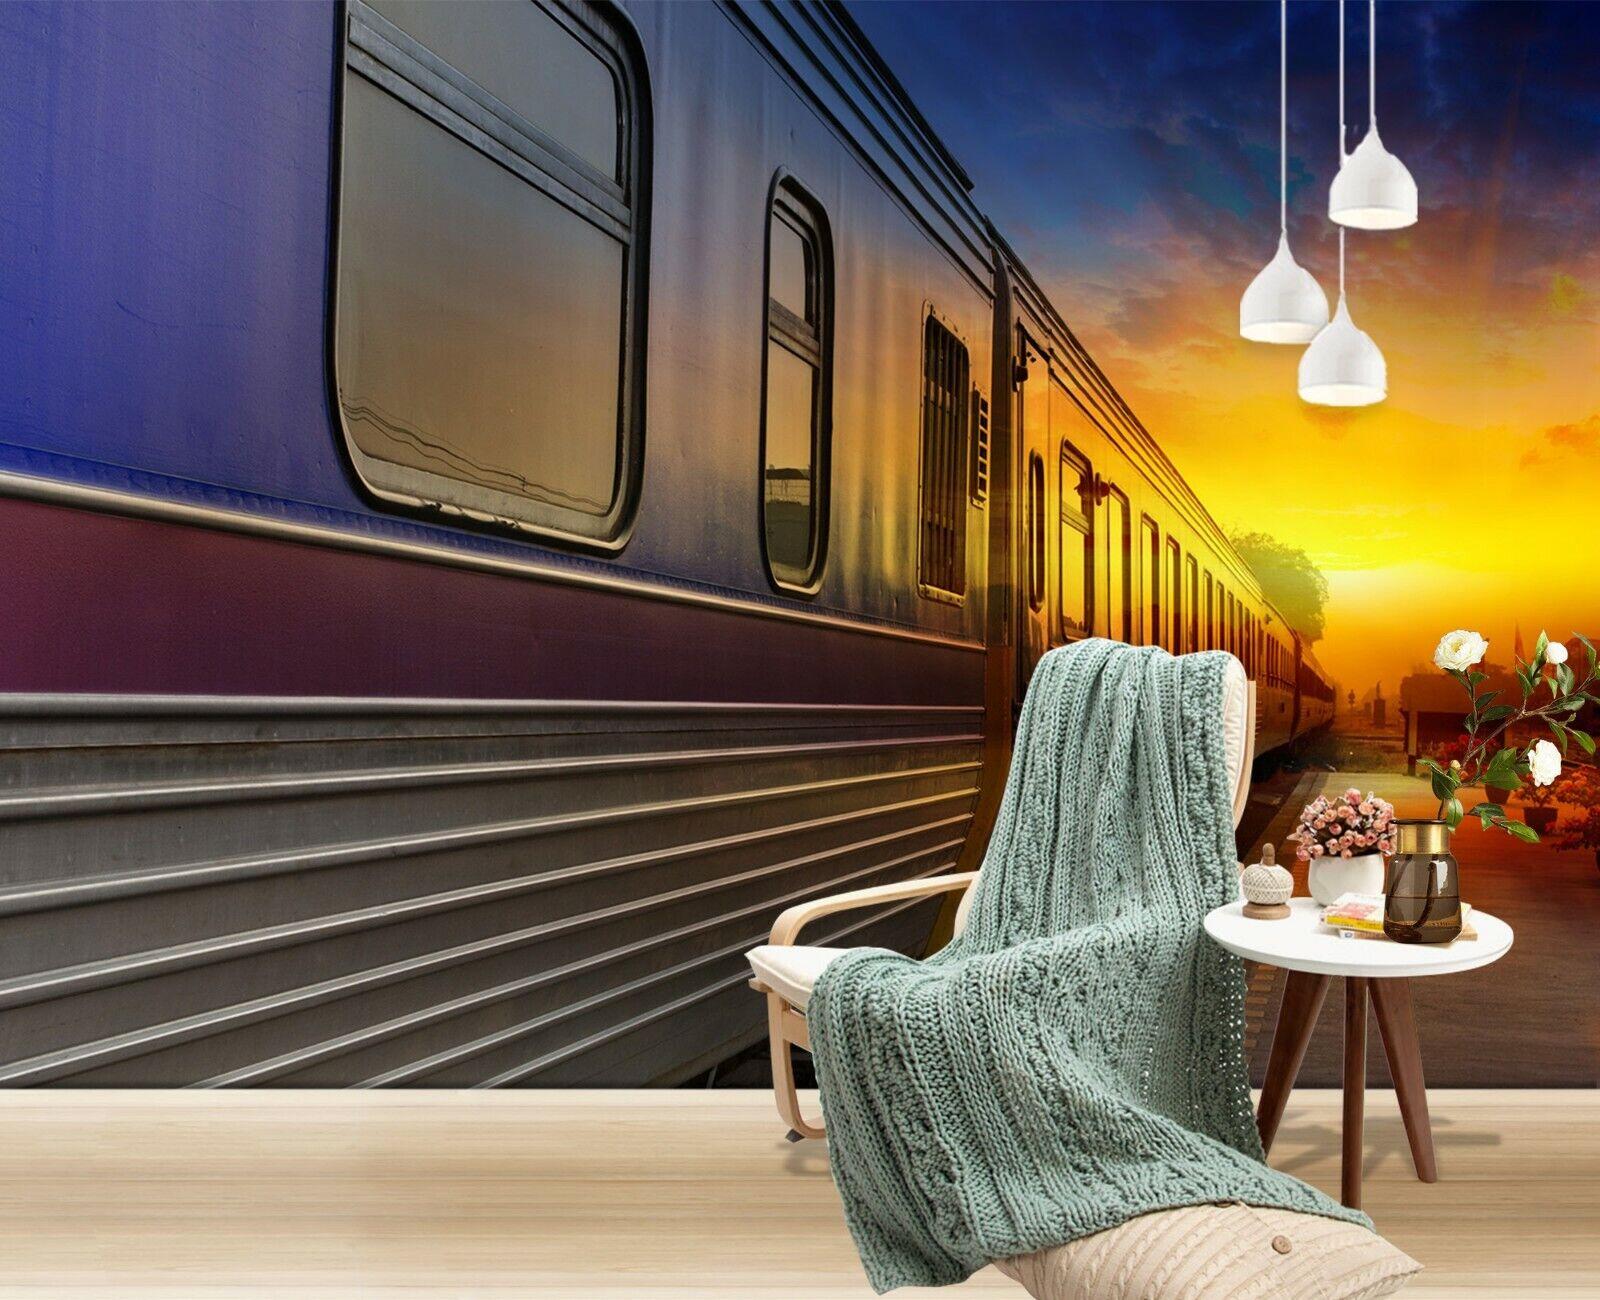 3D Train Sunset B254 Transport WandPapier Mural Self-adhesive Removable Wendy